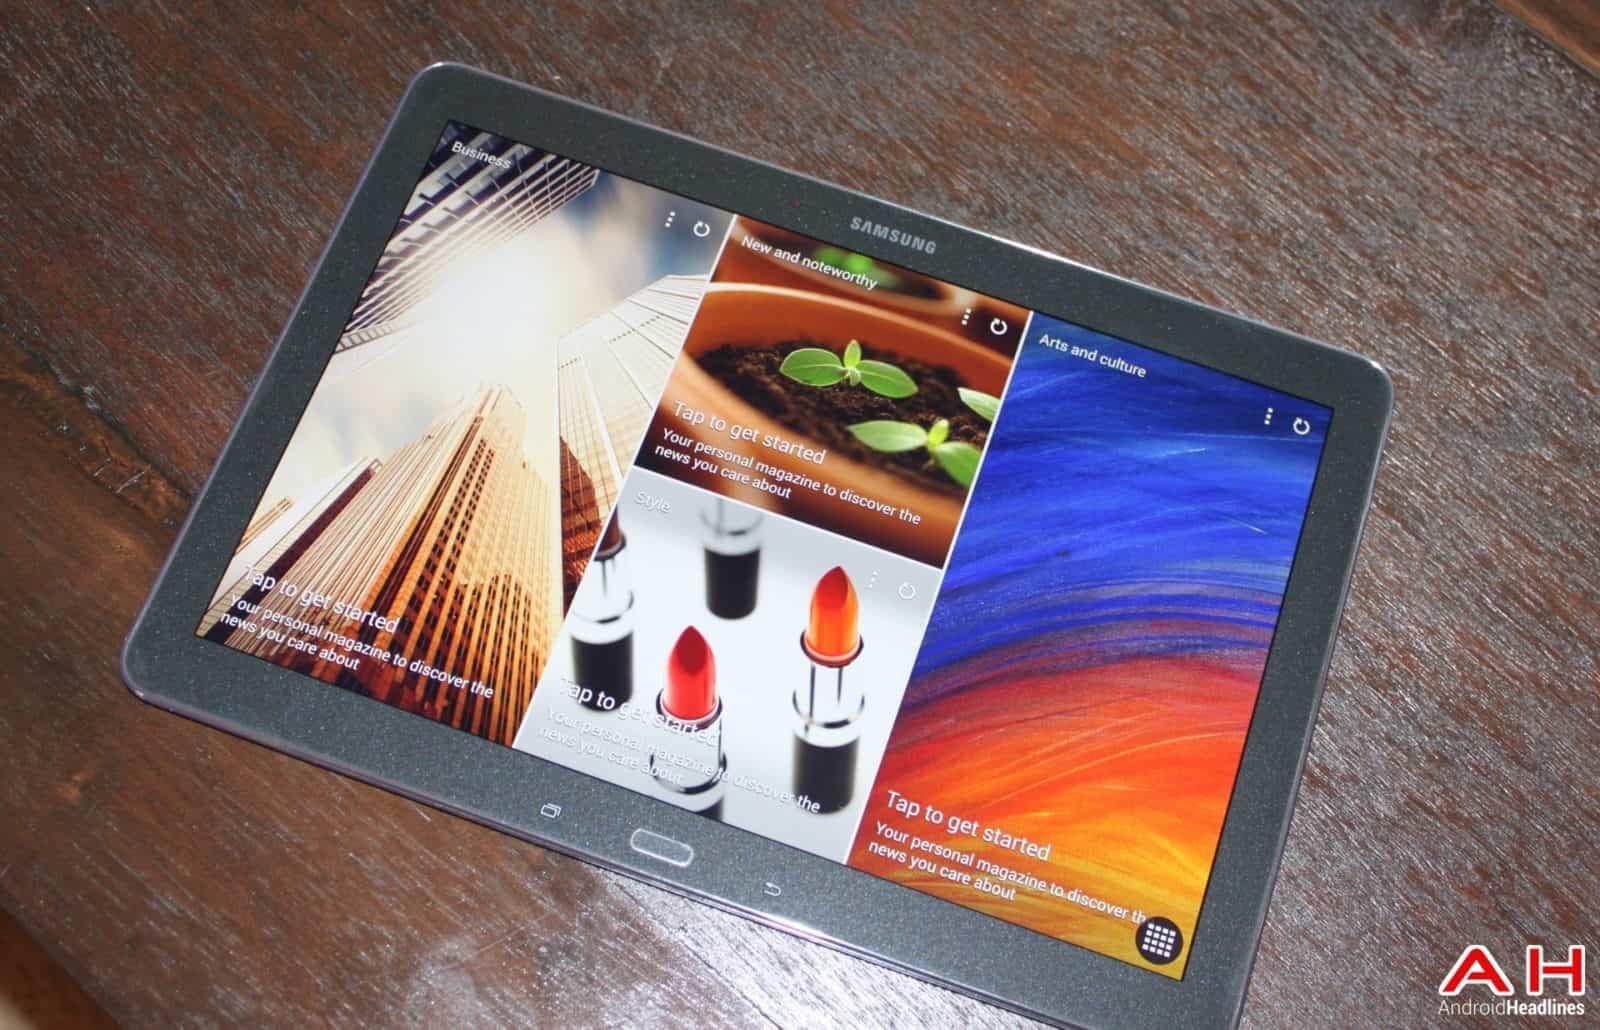 AH Samsung Galaxy 12.2 Tablet 1.1